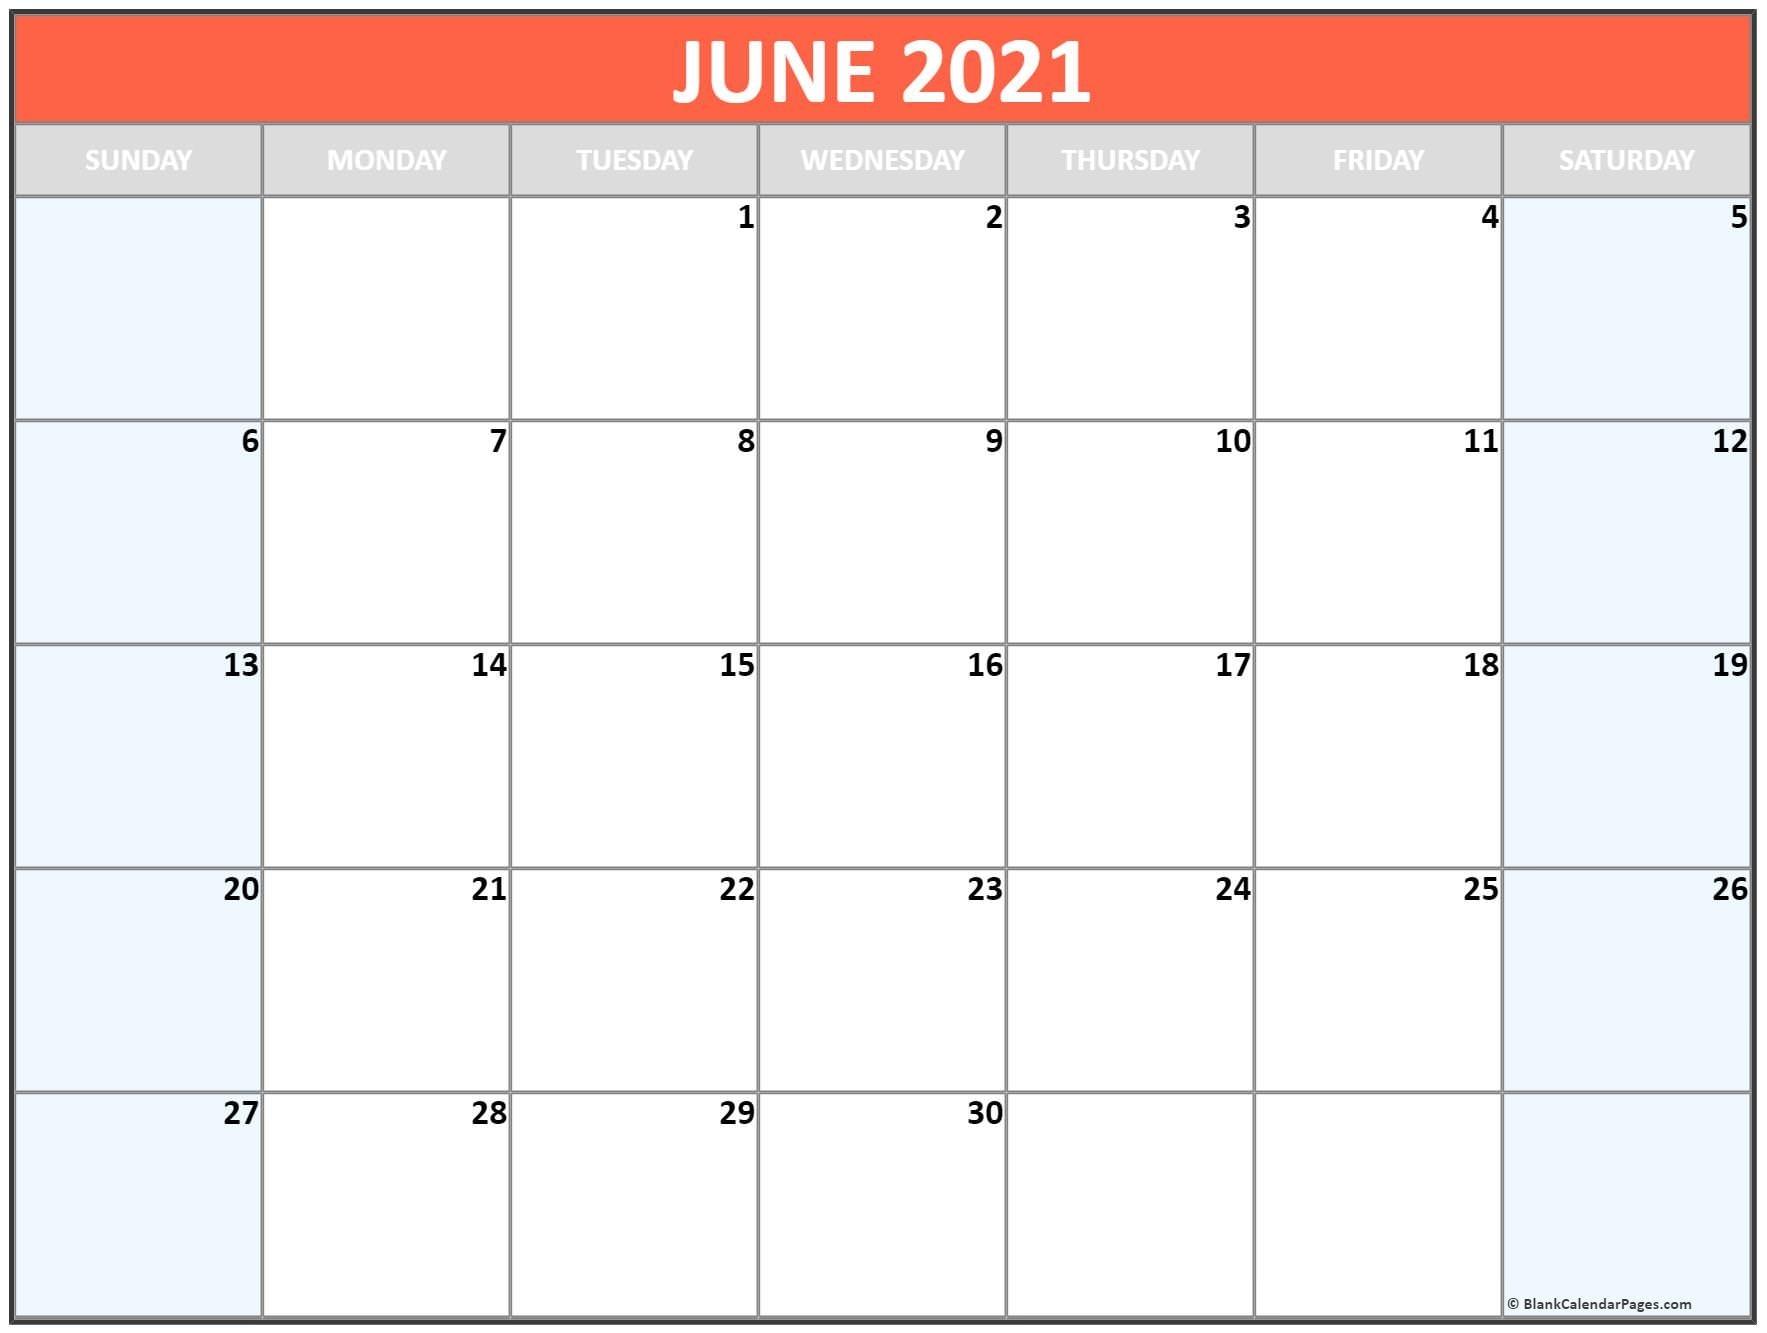 June 2021 Blank Calendar Templates. June 2020 To June 2021 Calendar Printable